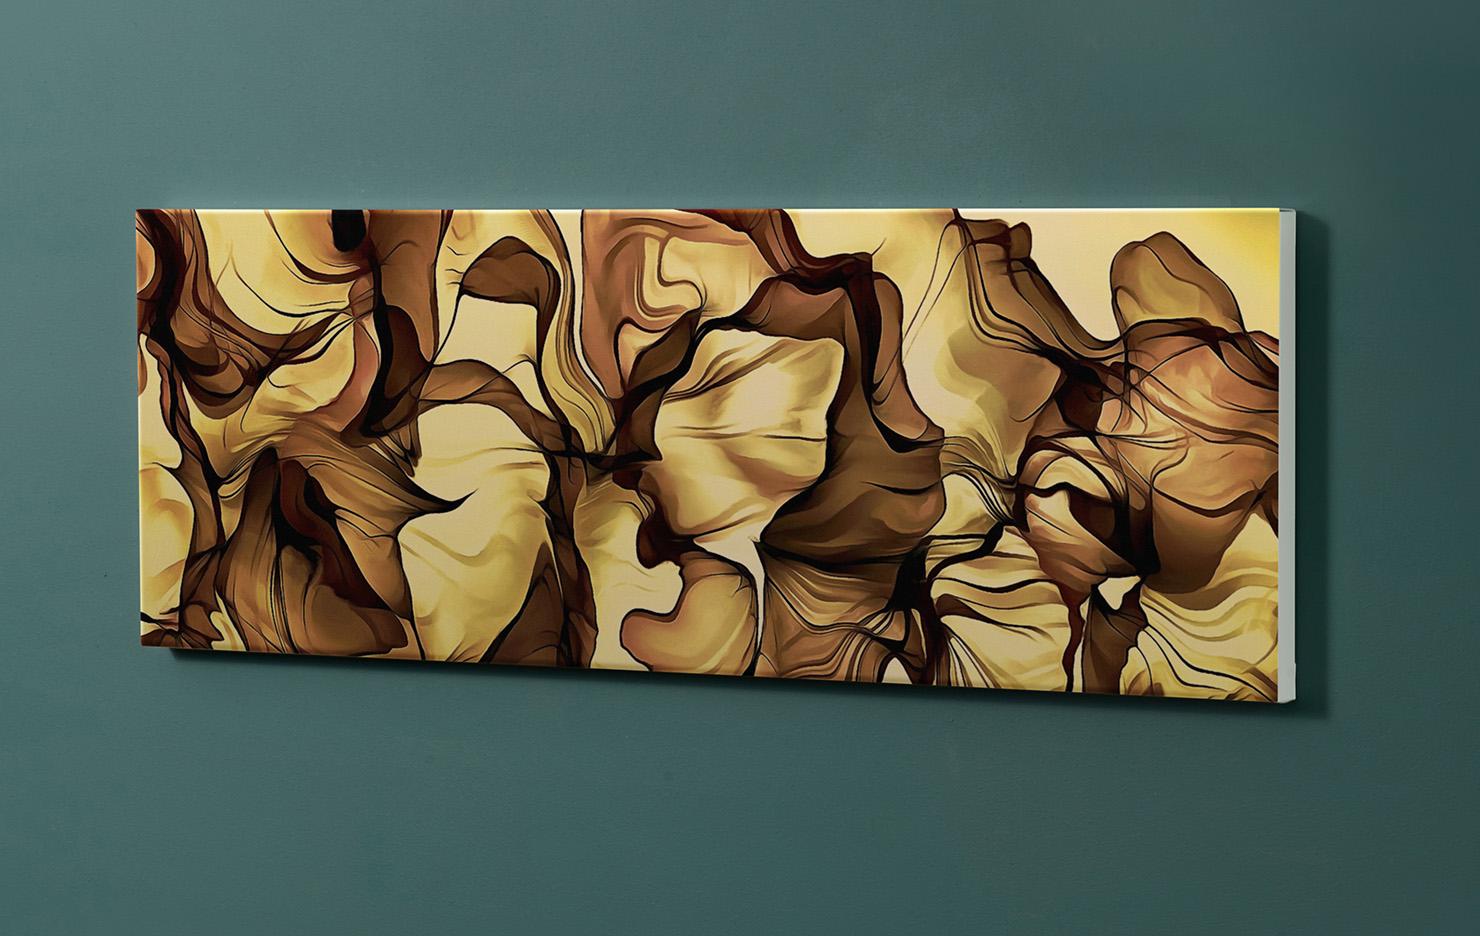 Magnettafel NOTIZ 90x30cm Motiv-Pinnwand M152 Kunst Modern